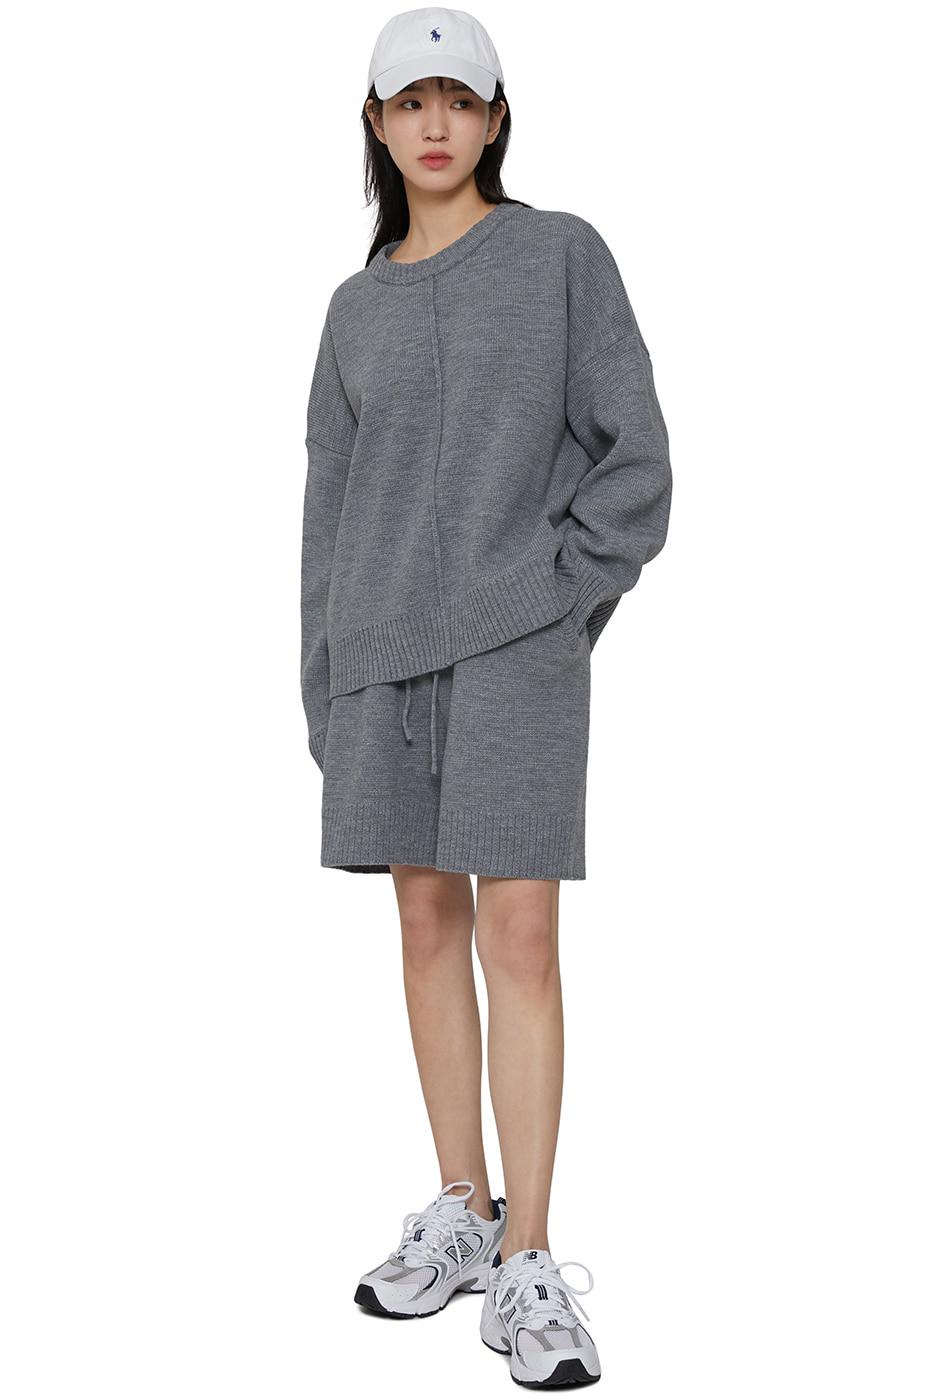 Laundry Knitwear Lounge Two Piece